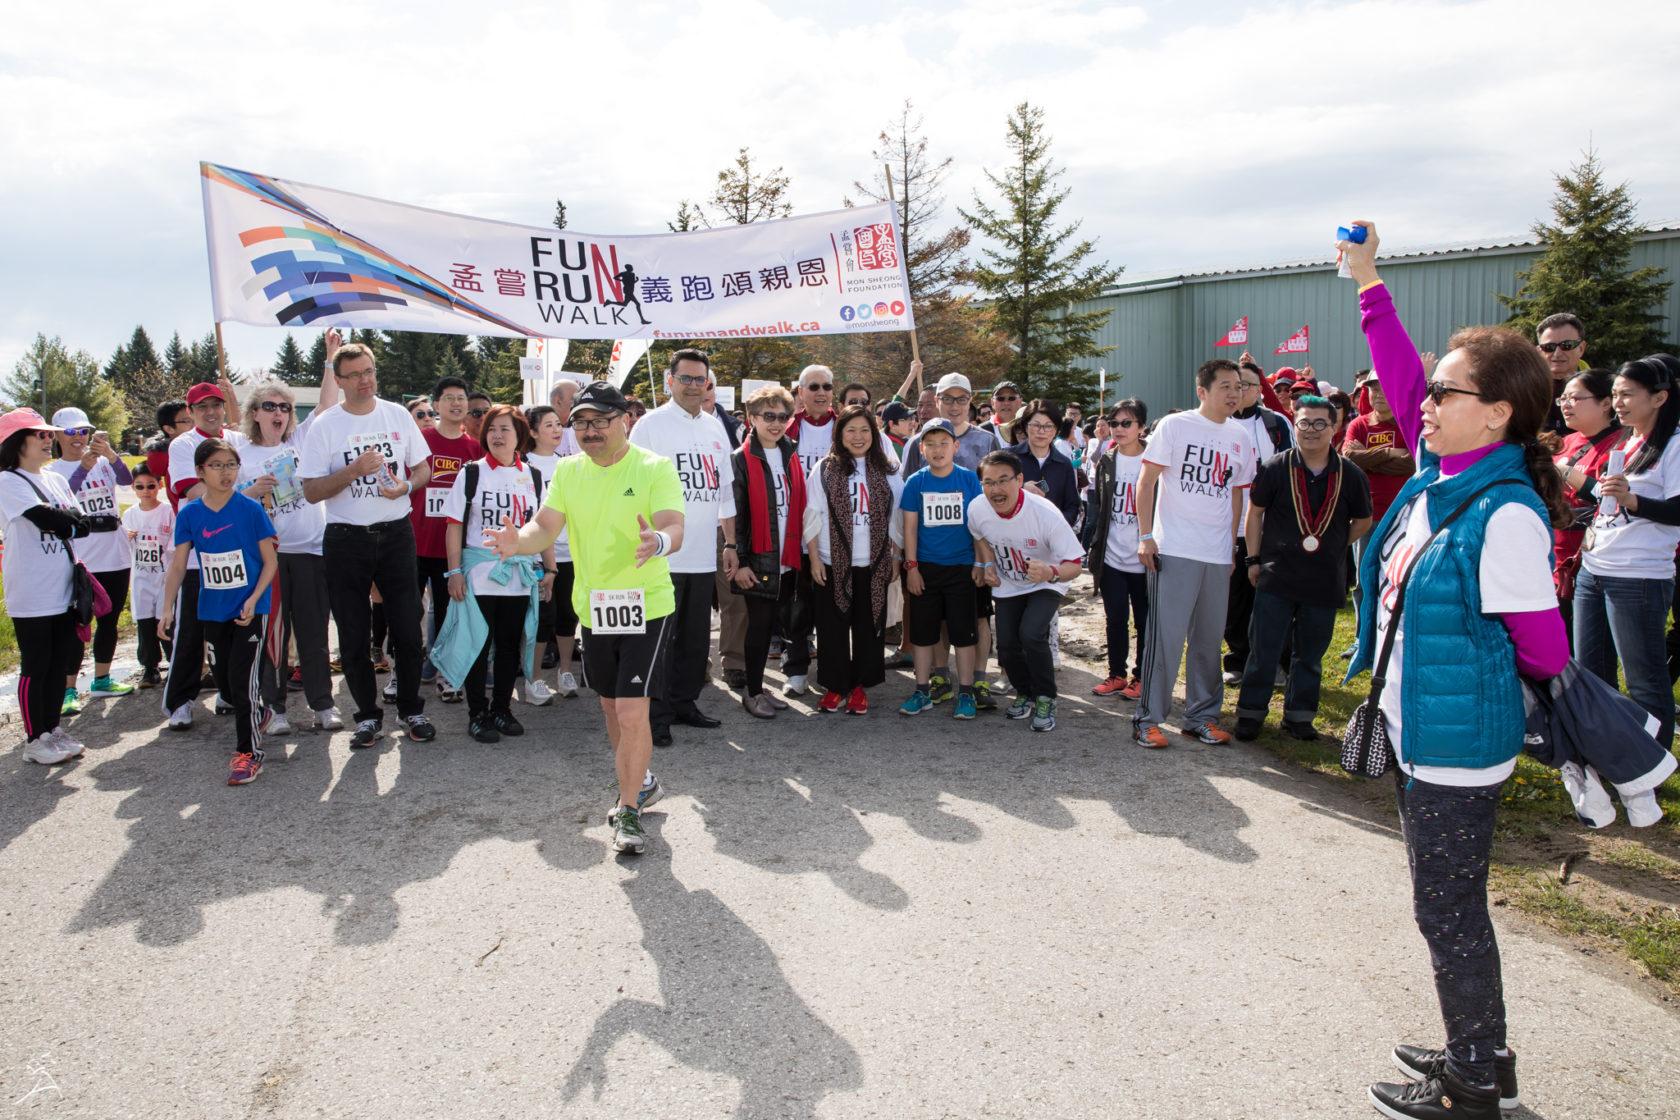 Fun Run and Walk annual event